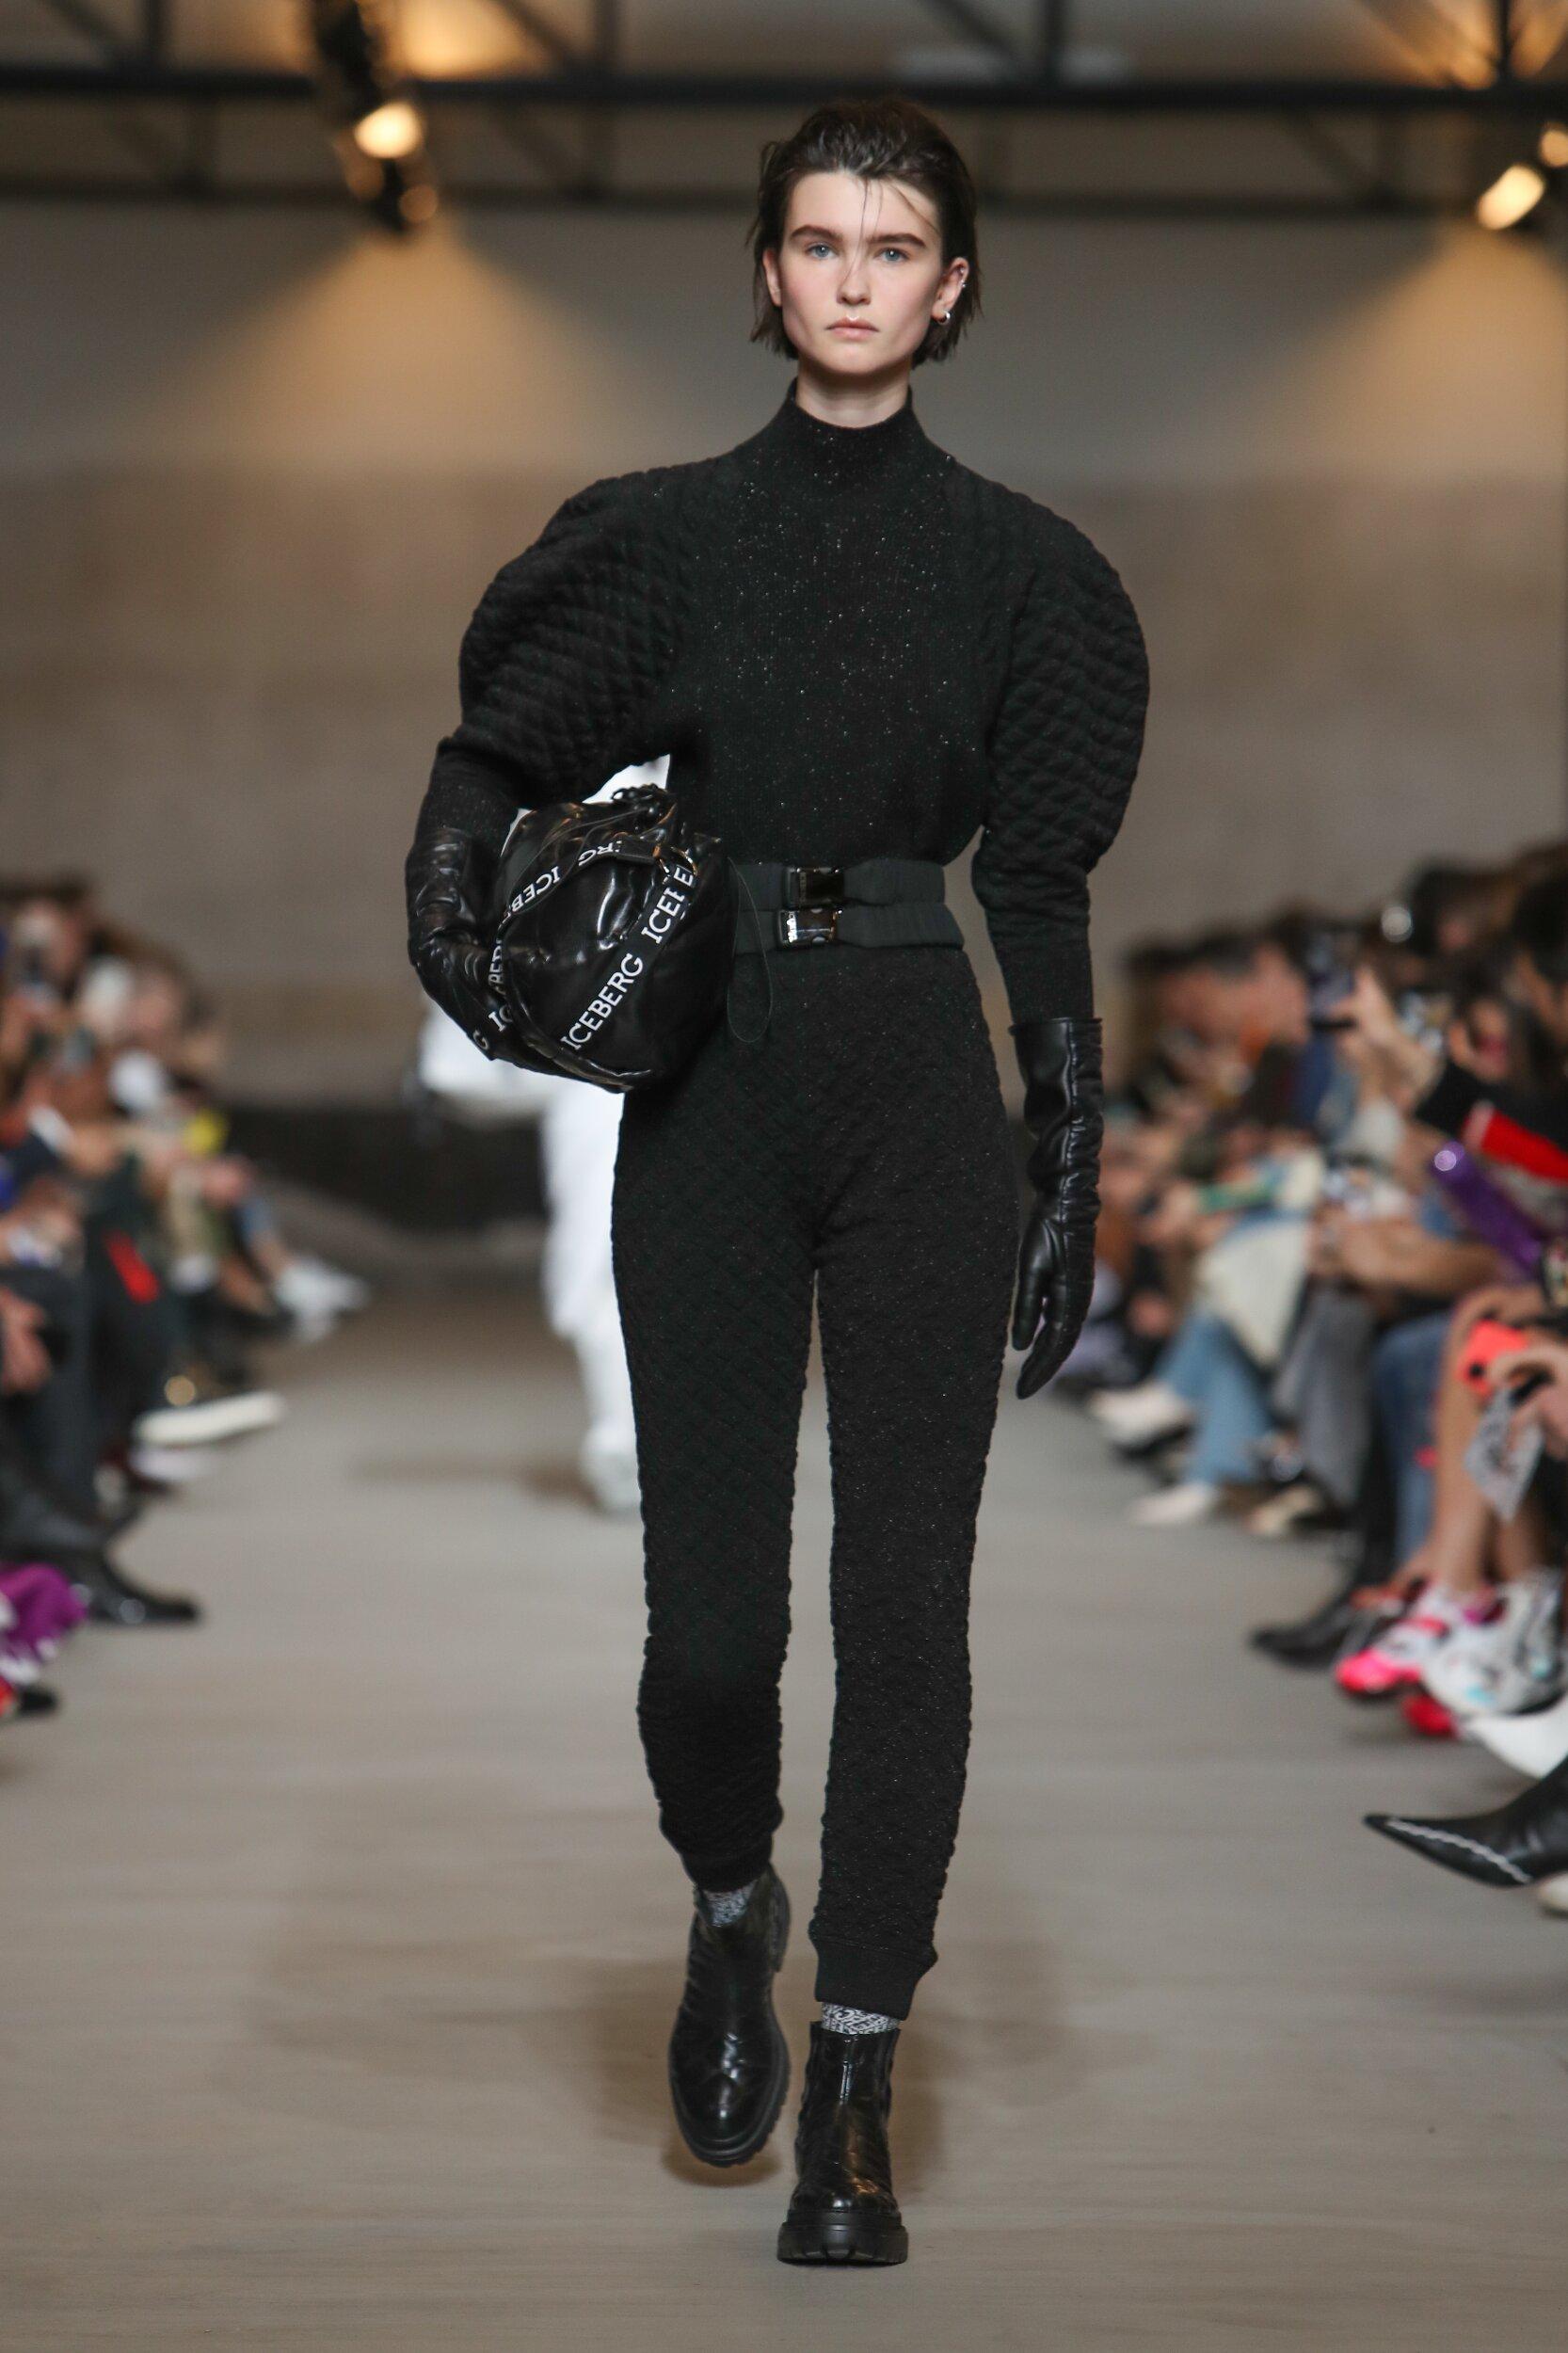 2020 Catwalk Iceberg Woman Fashion Show Winter